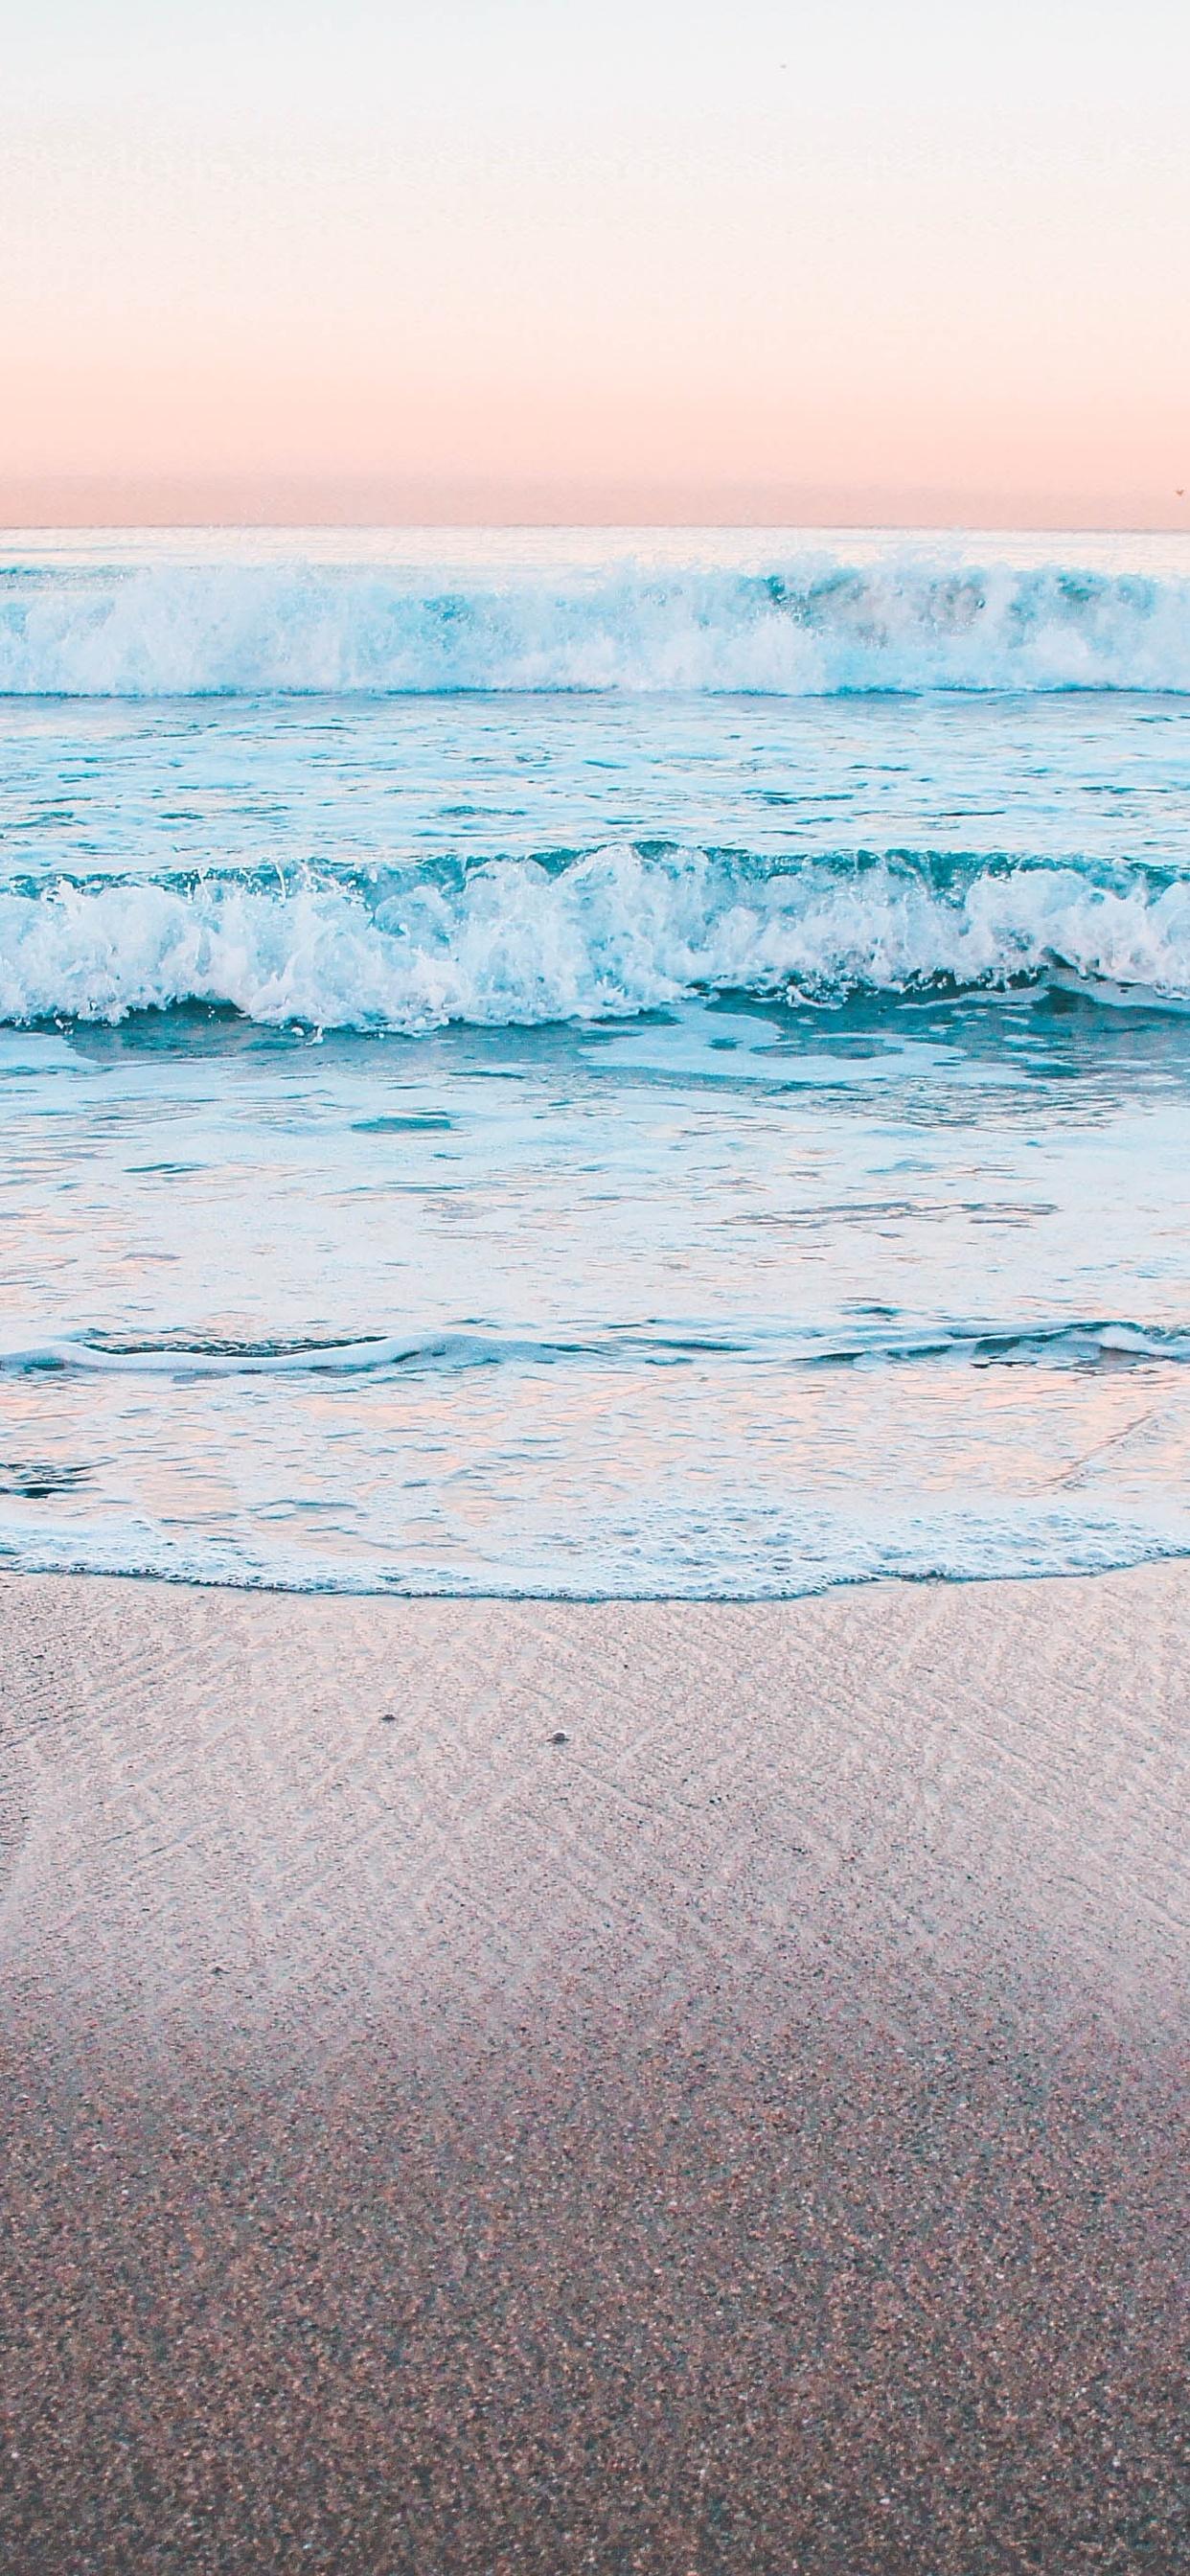 1242x2688 Peaceful Calm Waves 5k Iphone Xs Max Hd 4k